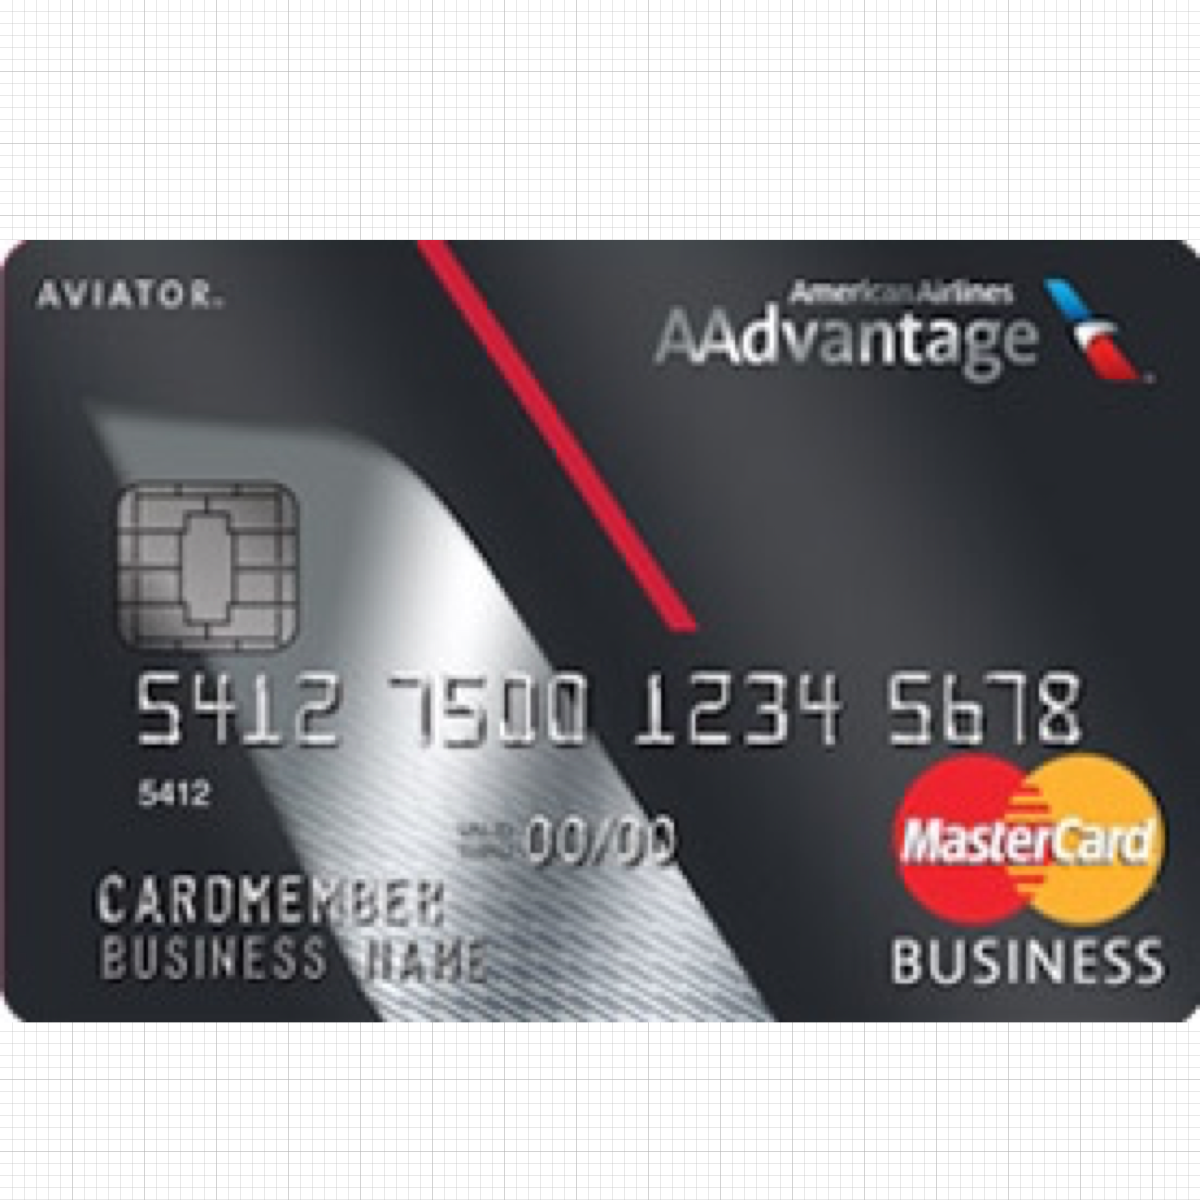 Download HD Aviator Business Card - Mastercard Transparent PNG